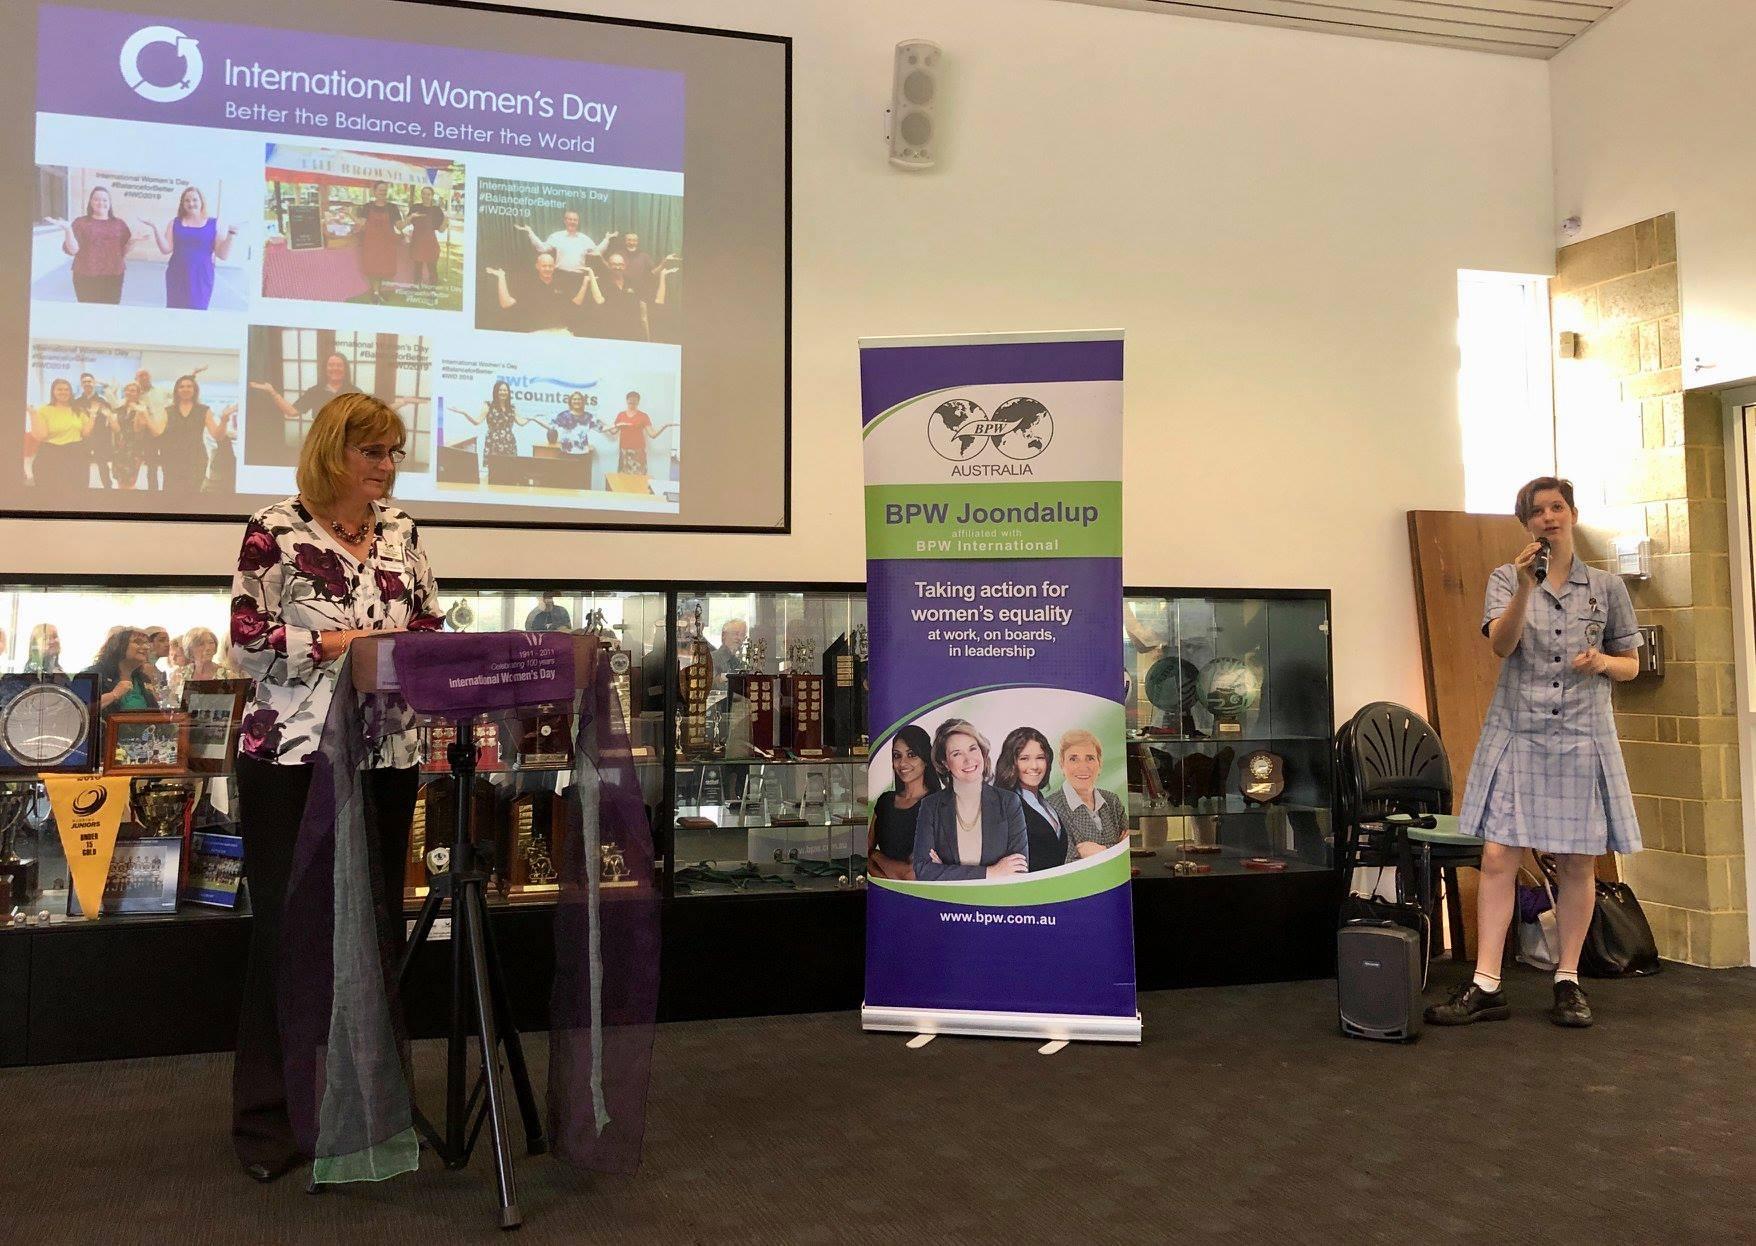 BPW women - Western Australlia - IWD